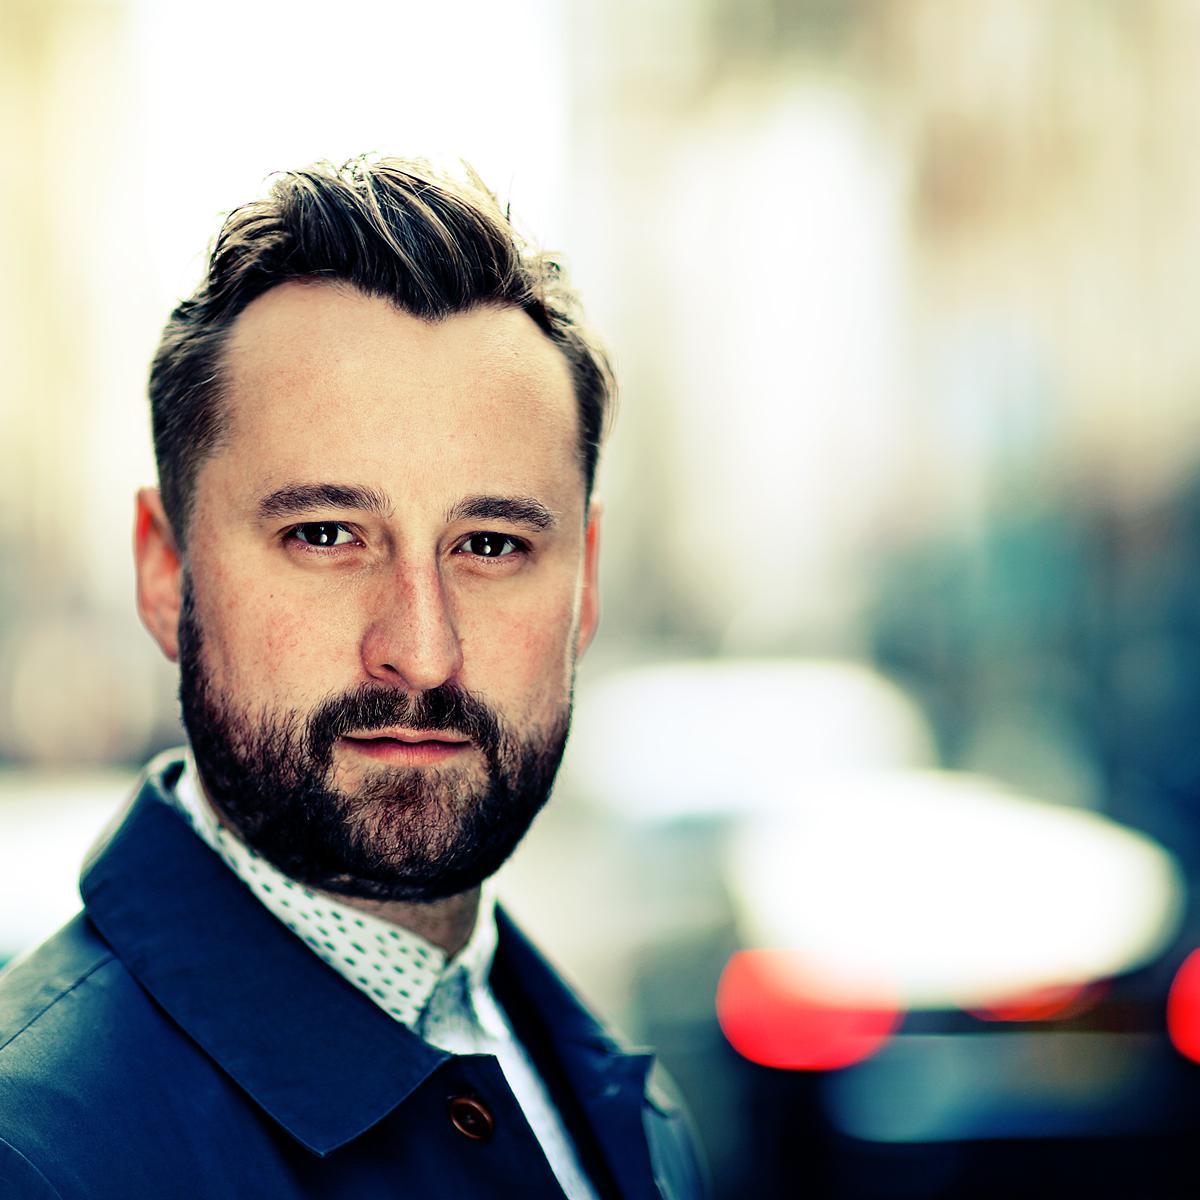 Professional linkedin photo of Alex Walker-Sage (Studio of Art & Commerce, London) by Julian Hanford